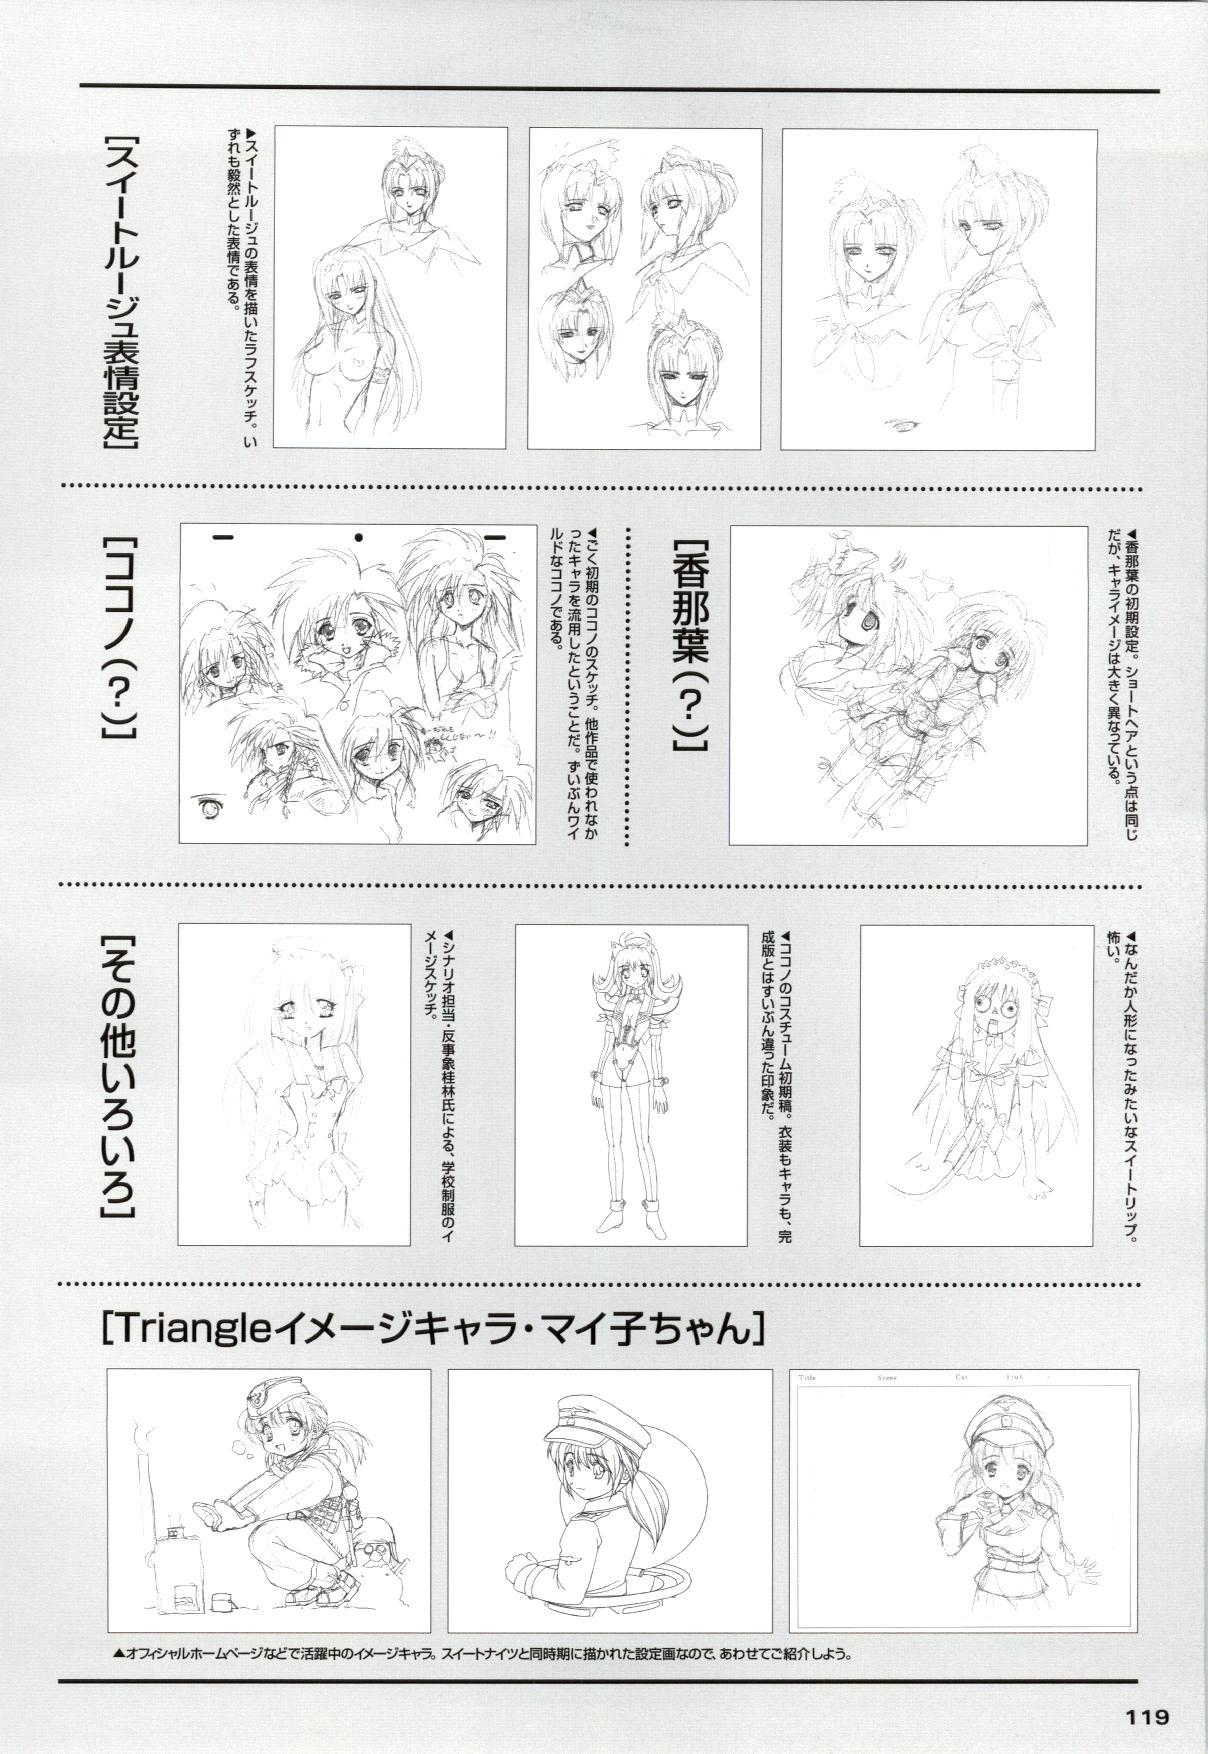 Mahou Senshi Sweet Knight & Mahou Senshi Princess Tear 118